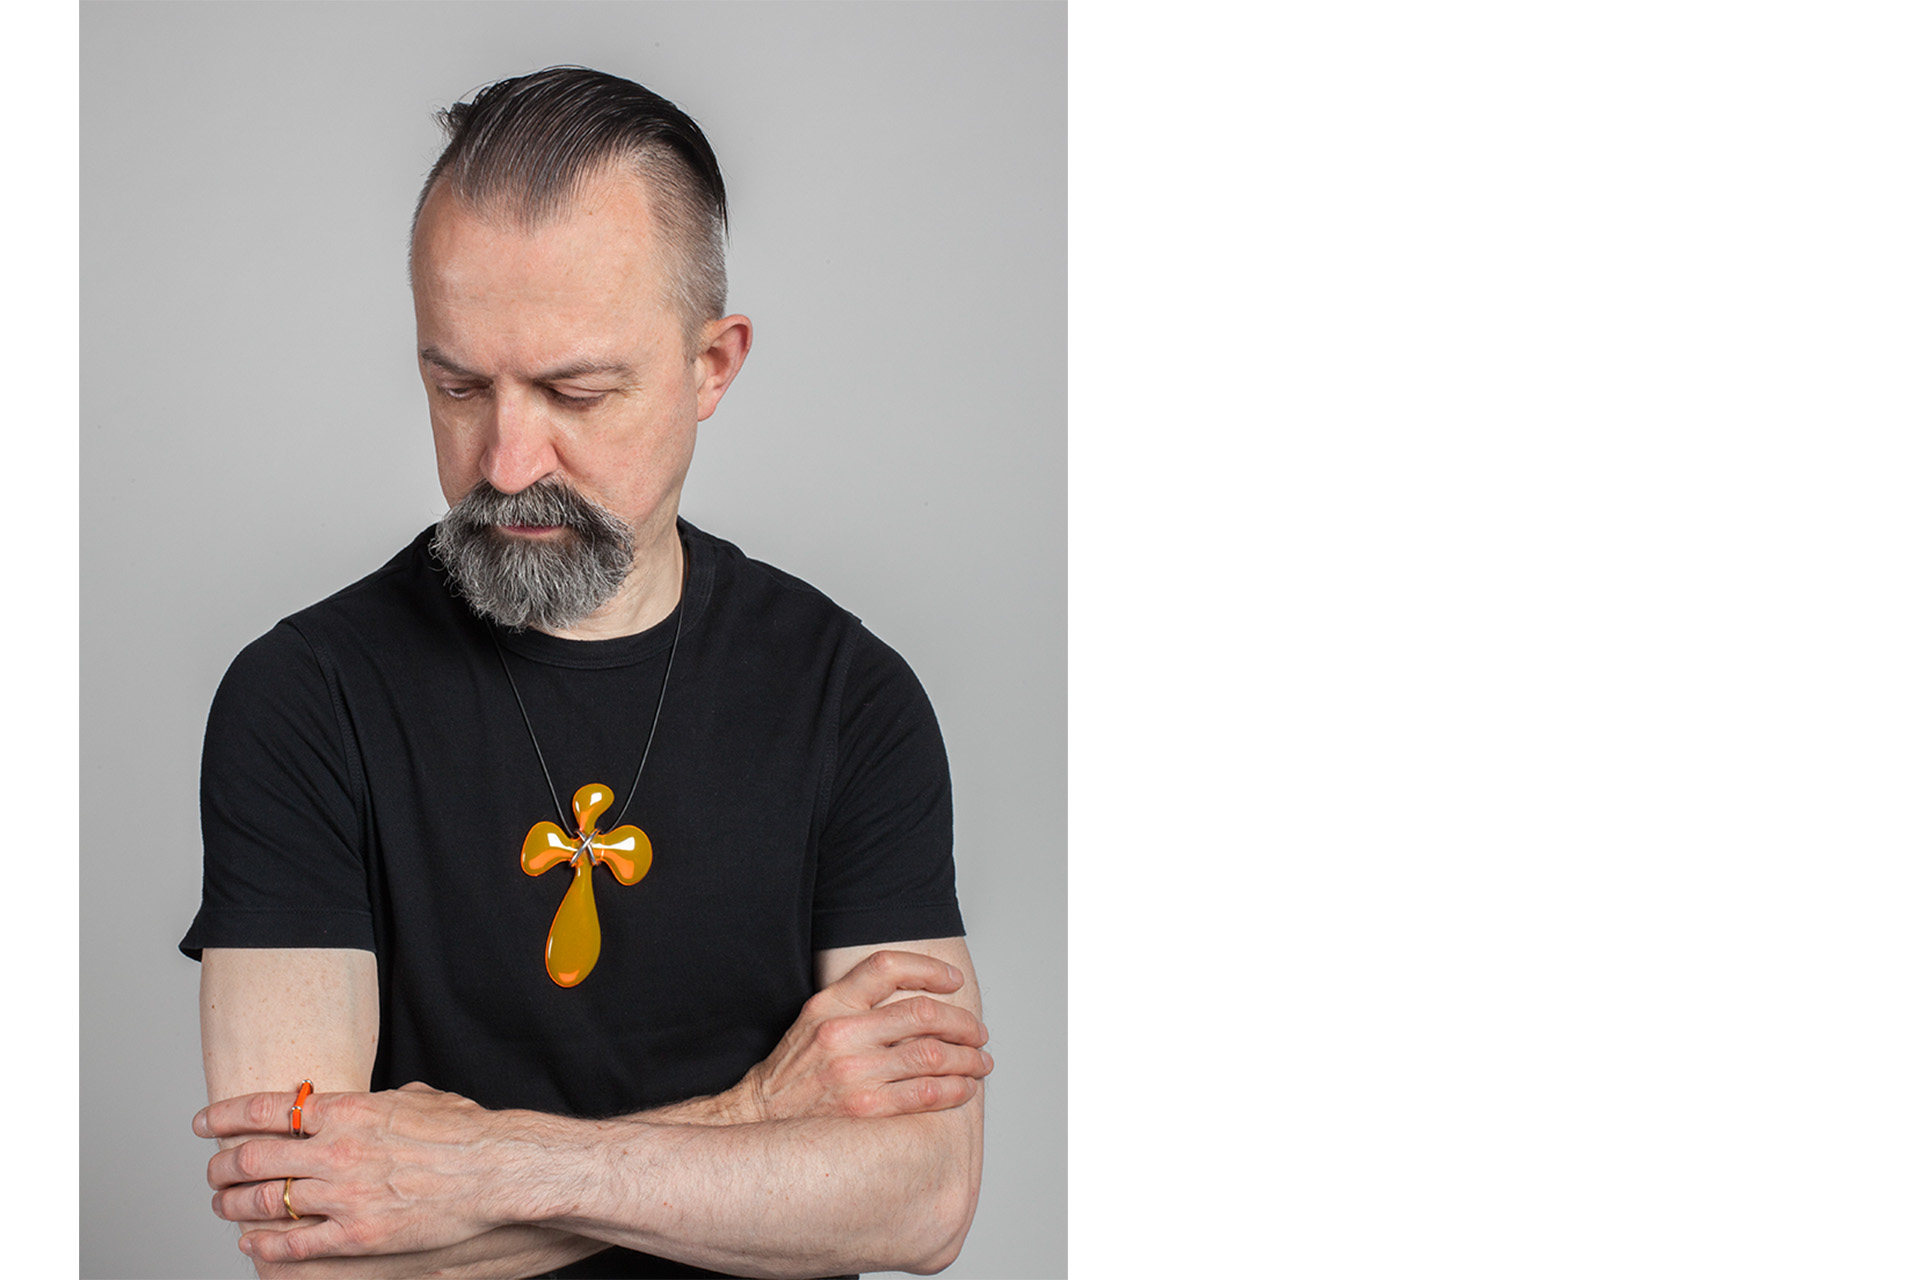 website gt - Paul with yello cross